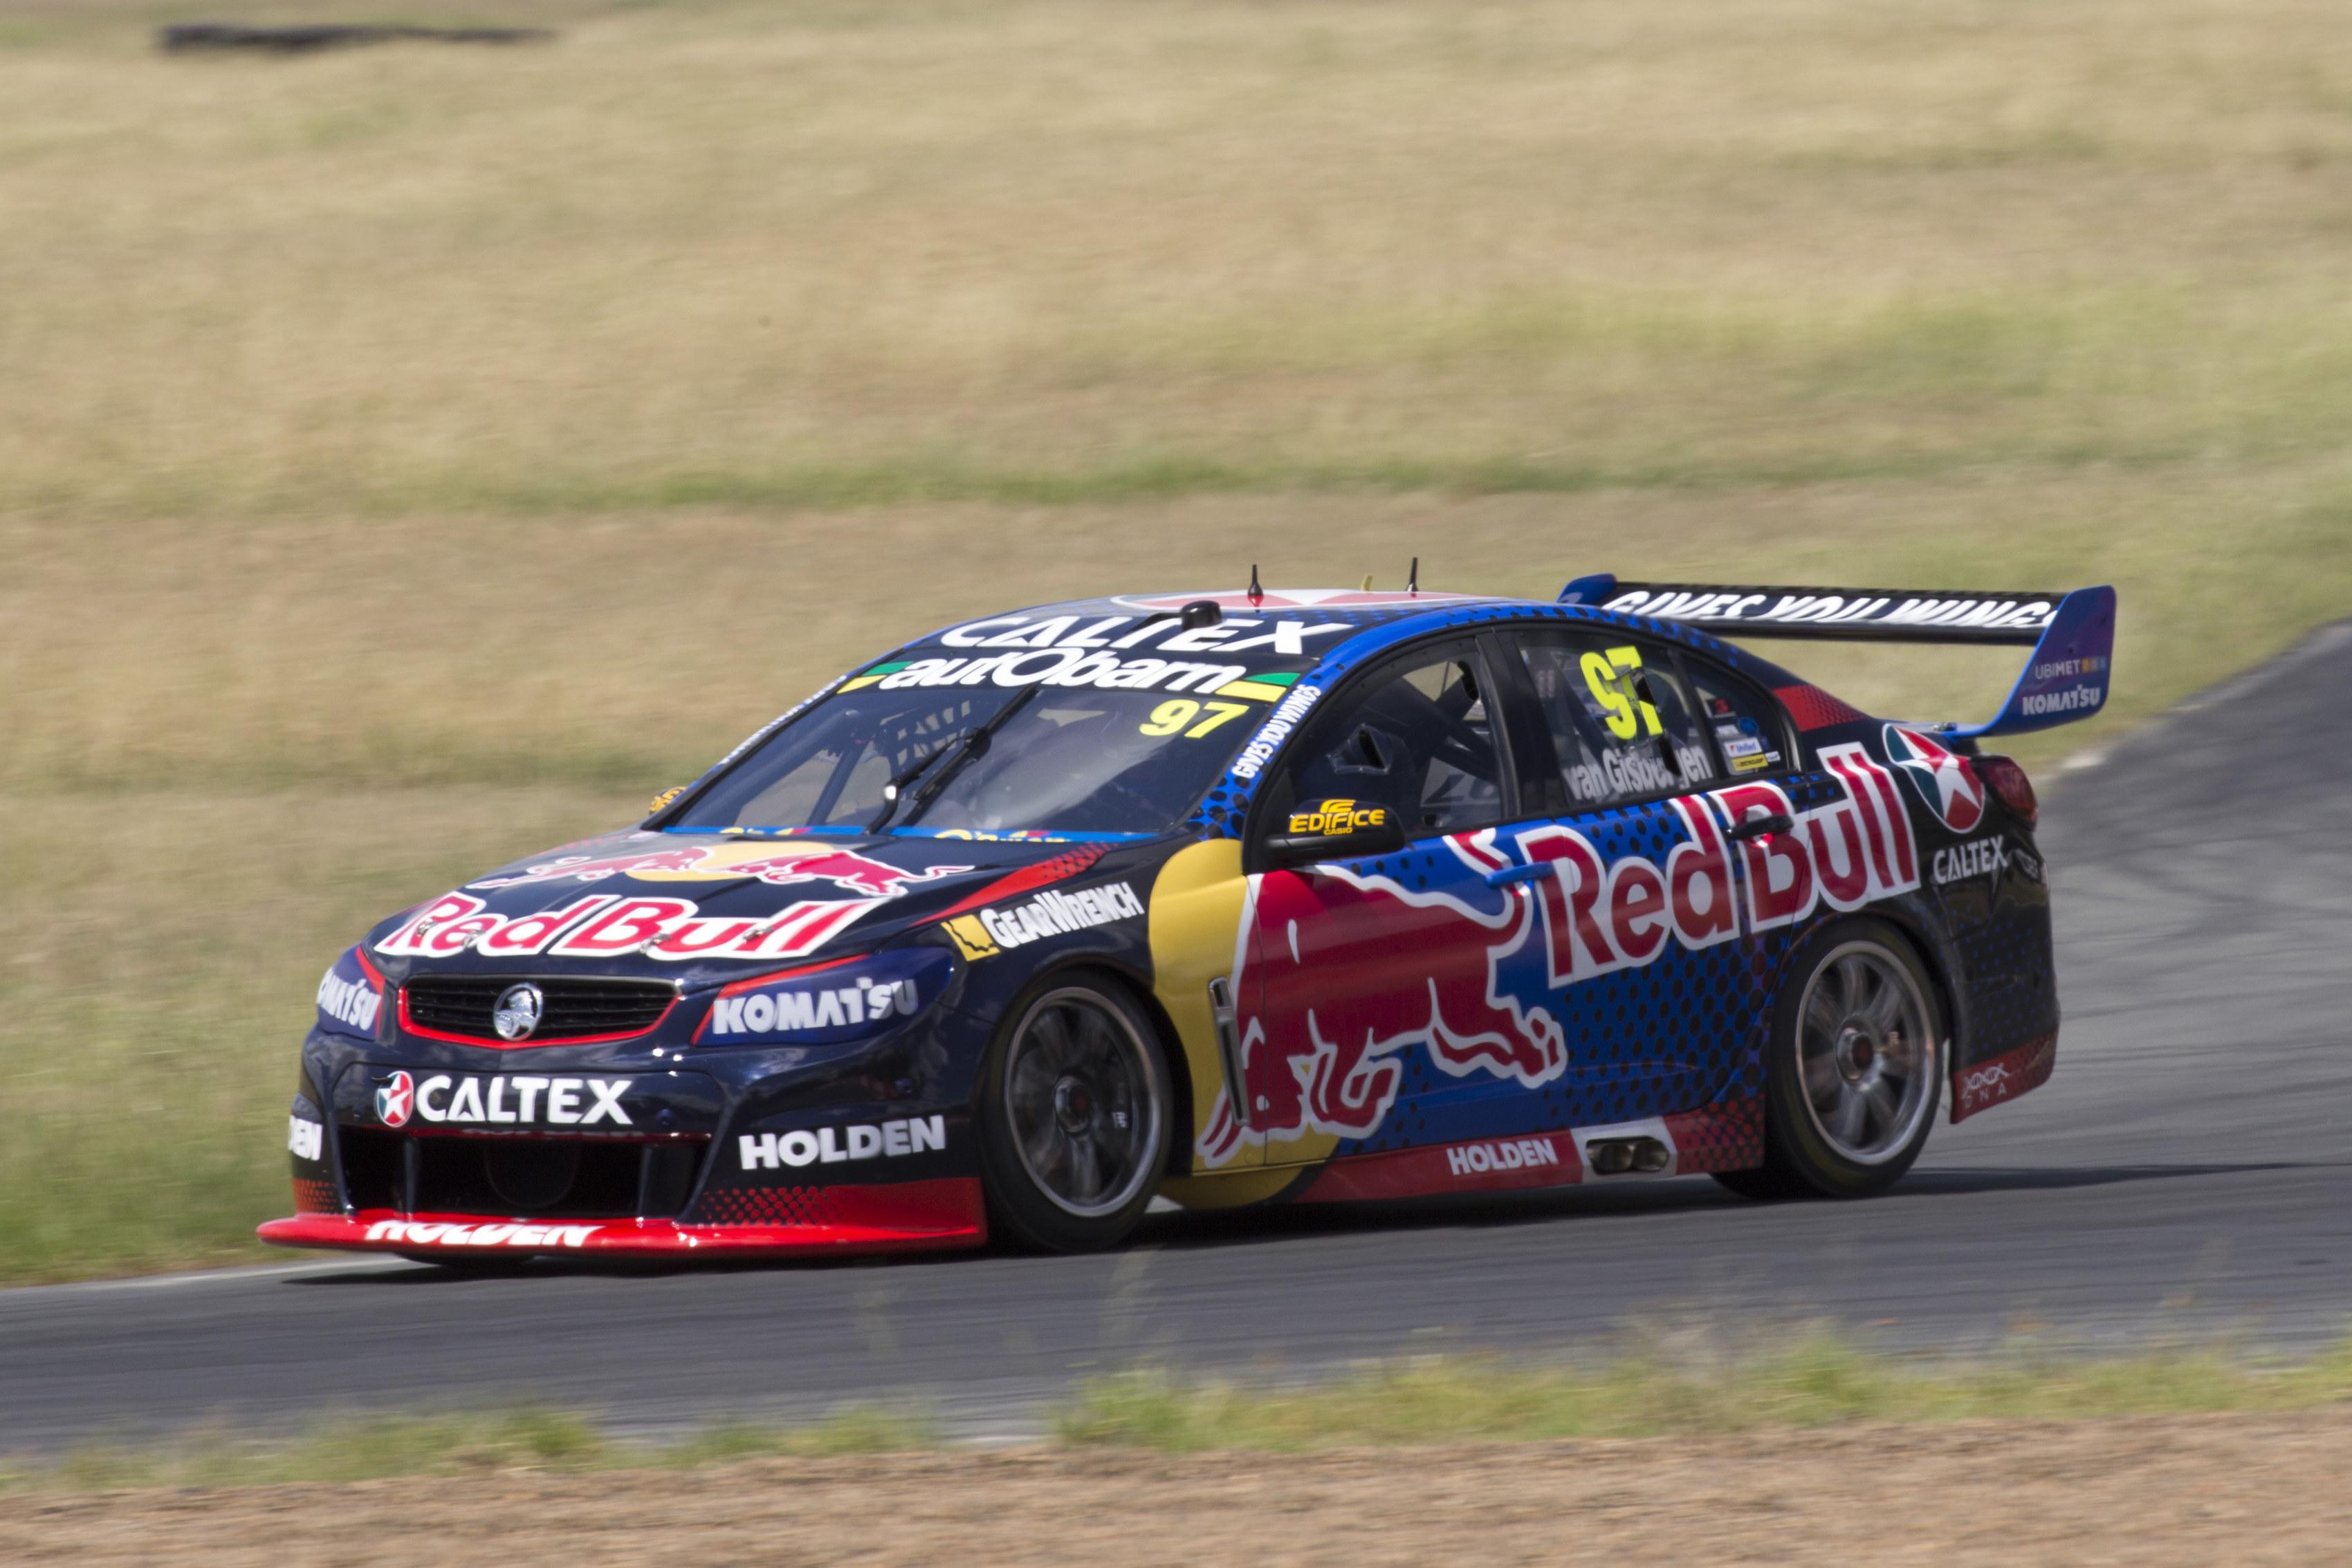 Shane Van gisbergen during testing today at Queensland Raceway west of Brisbane  Australia, February 18, 2016.